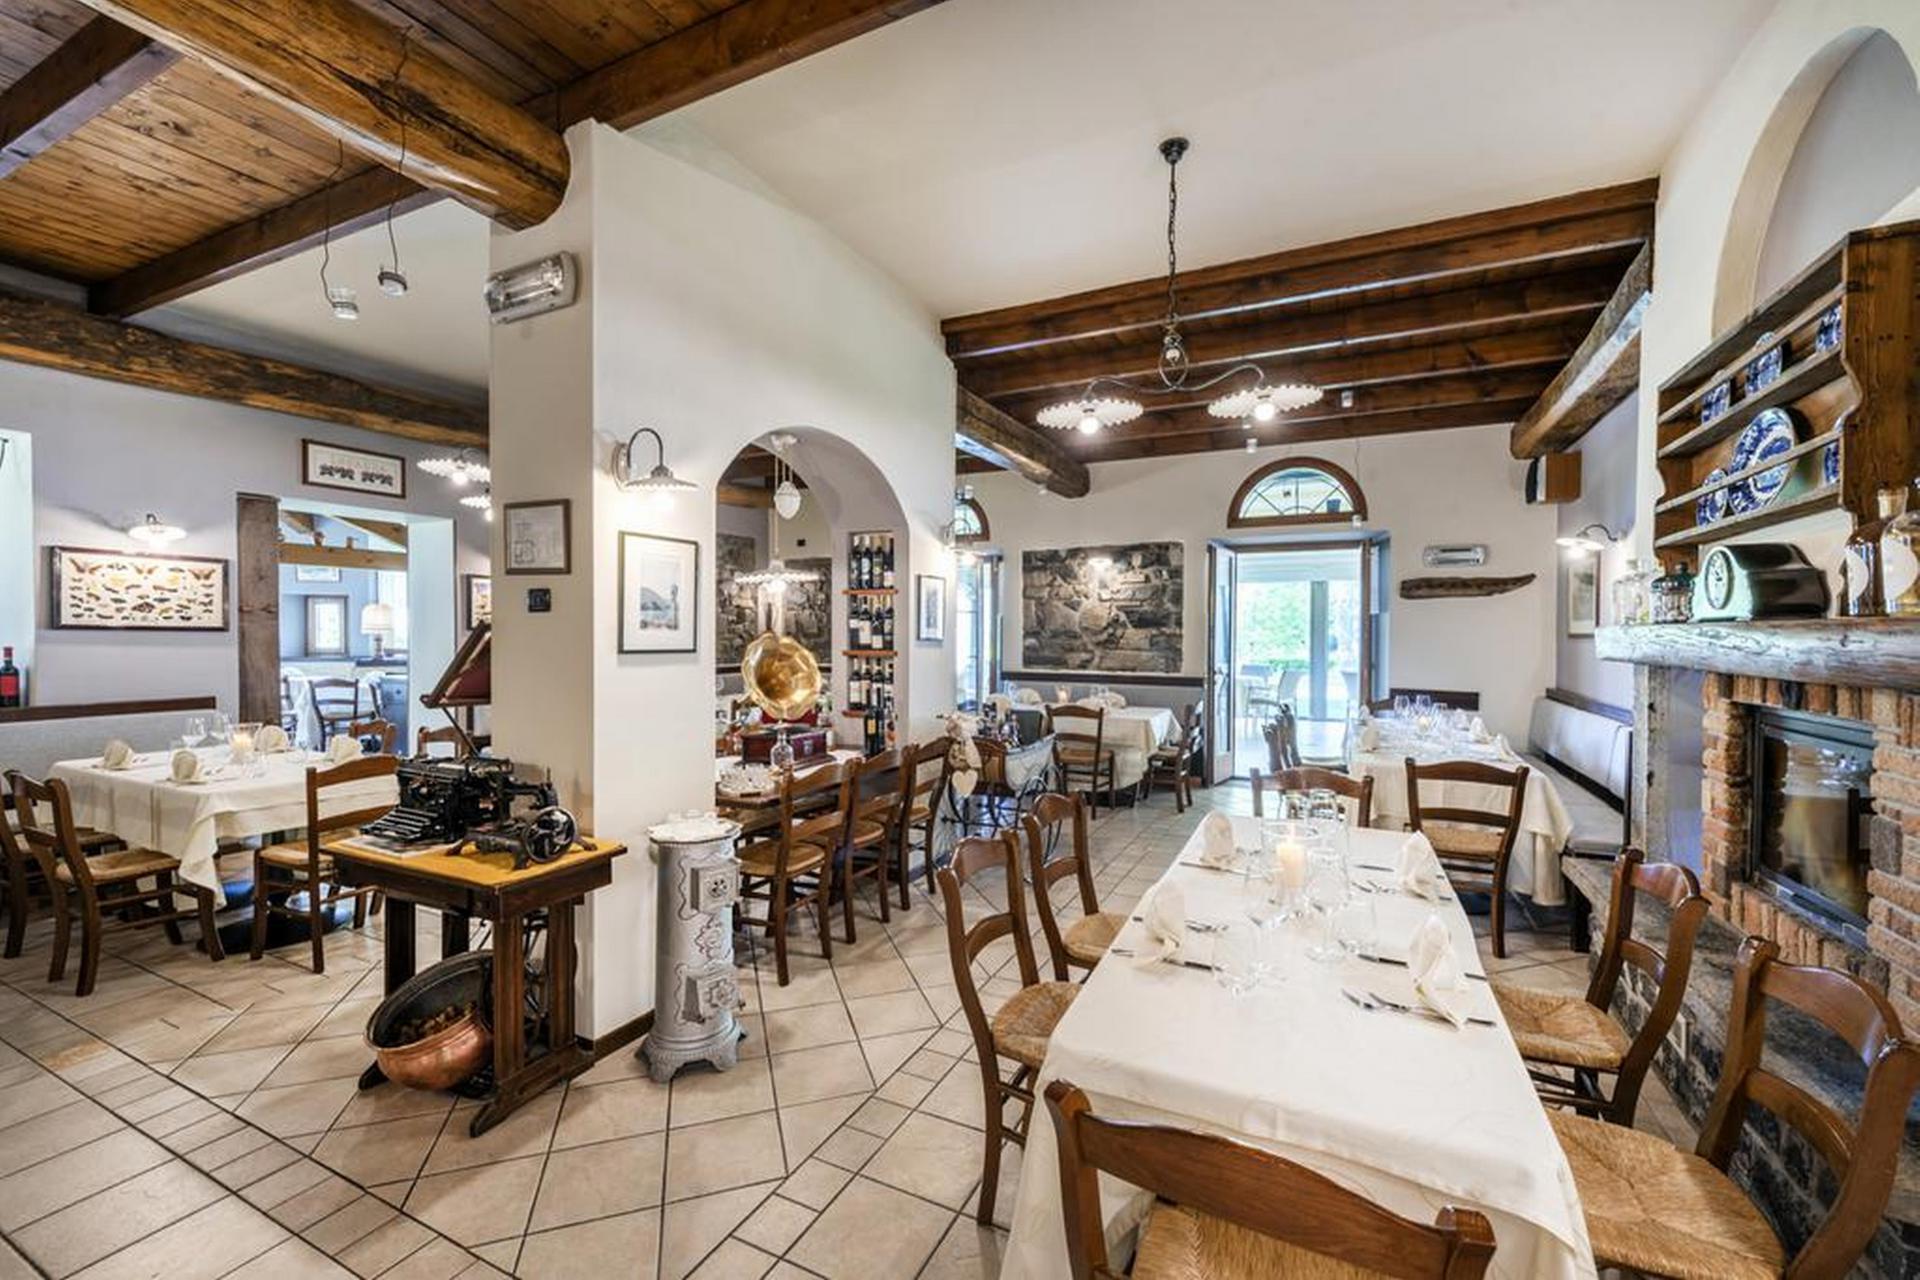 Agriturismo Comomeer en Gardameer Knusse agriturismo Comomeer met gezellig restaurant